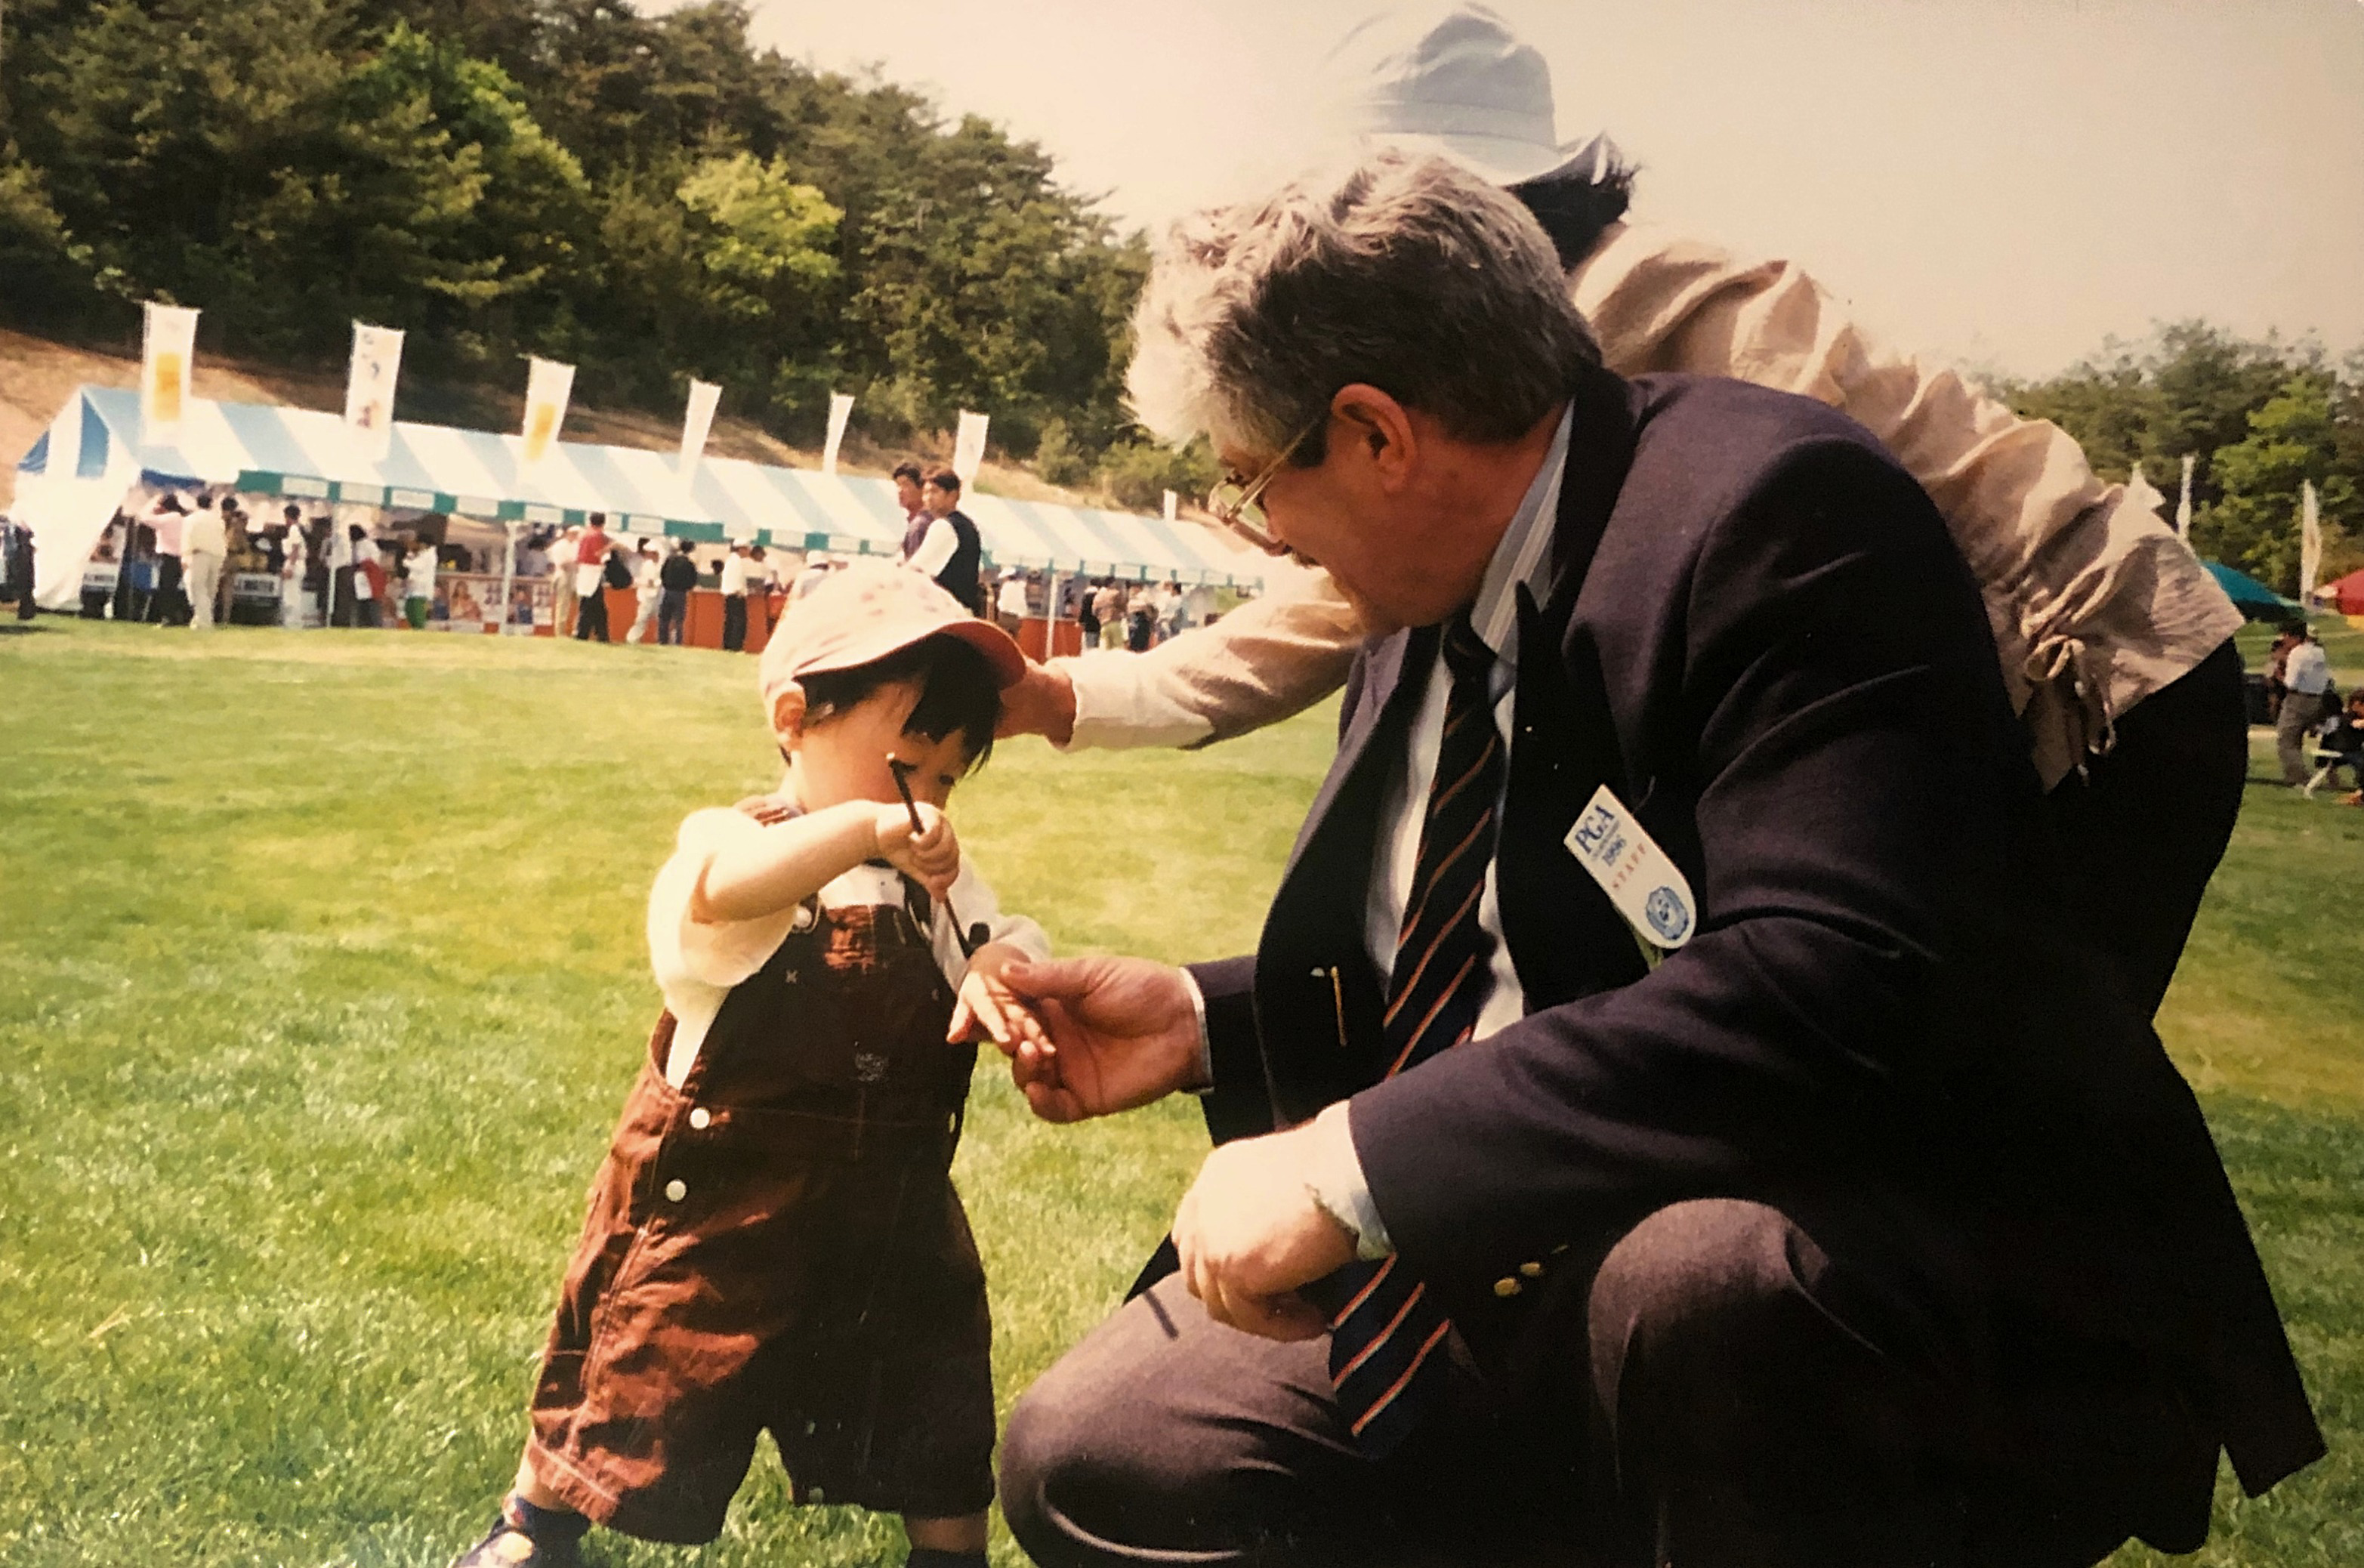 John giving a miniature club to a young Japanese golfer, Japan PGA Championship, 1996